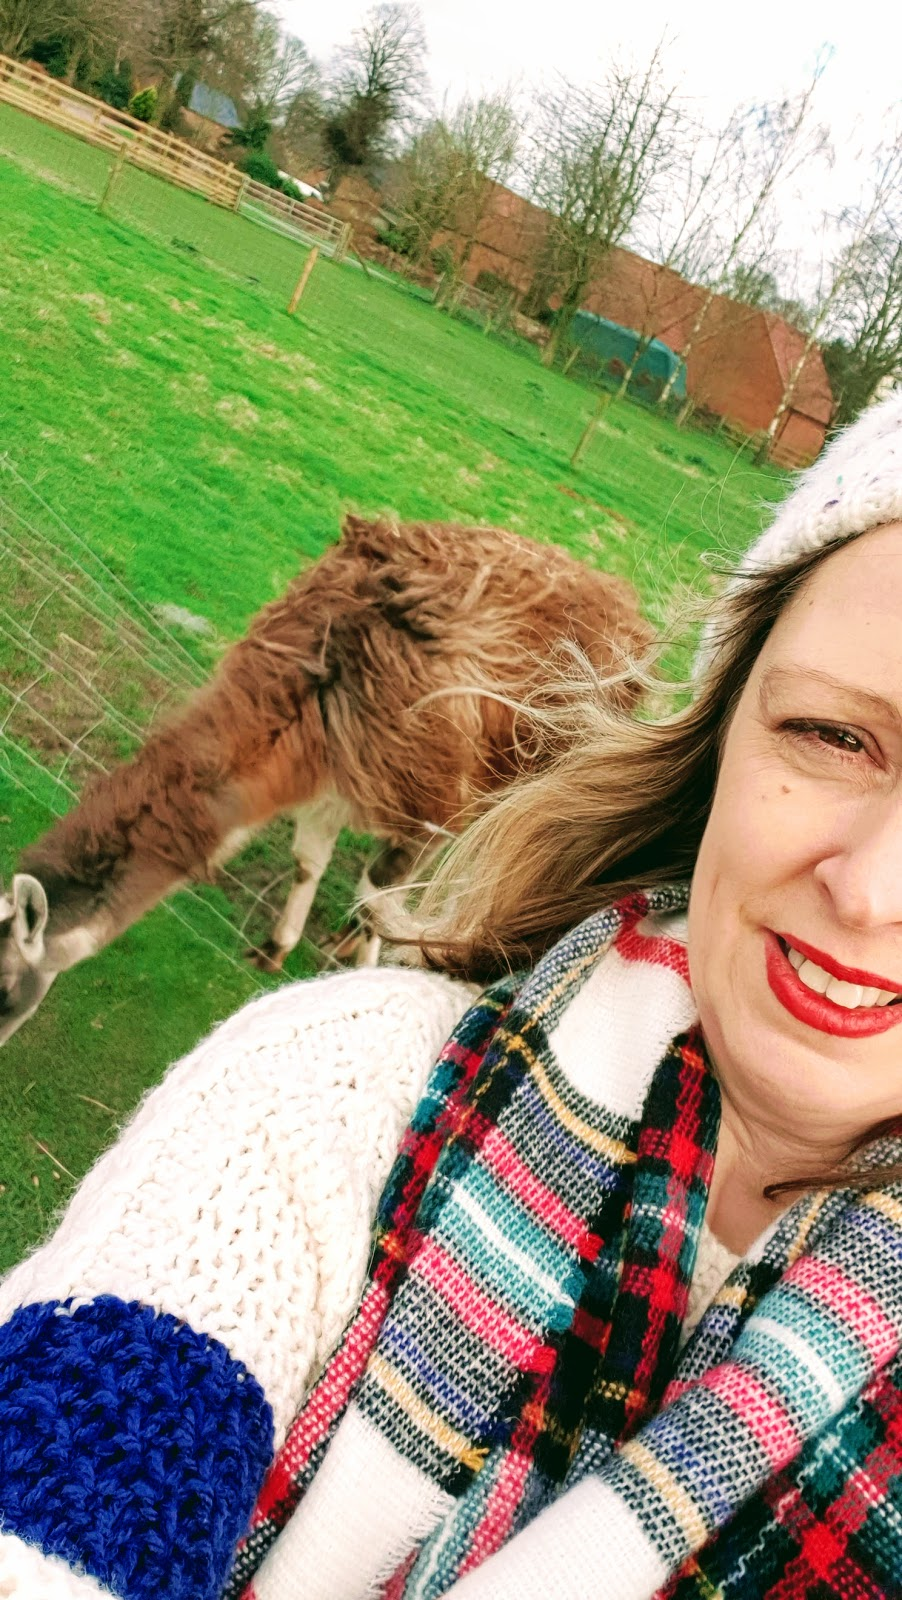 Selfie with a Brown llama